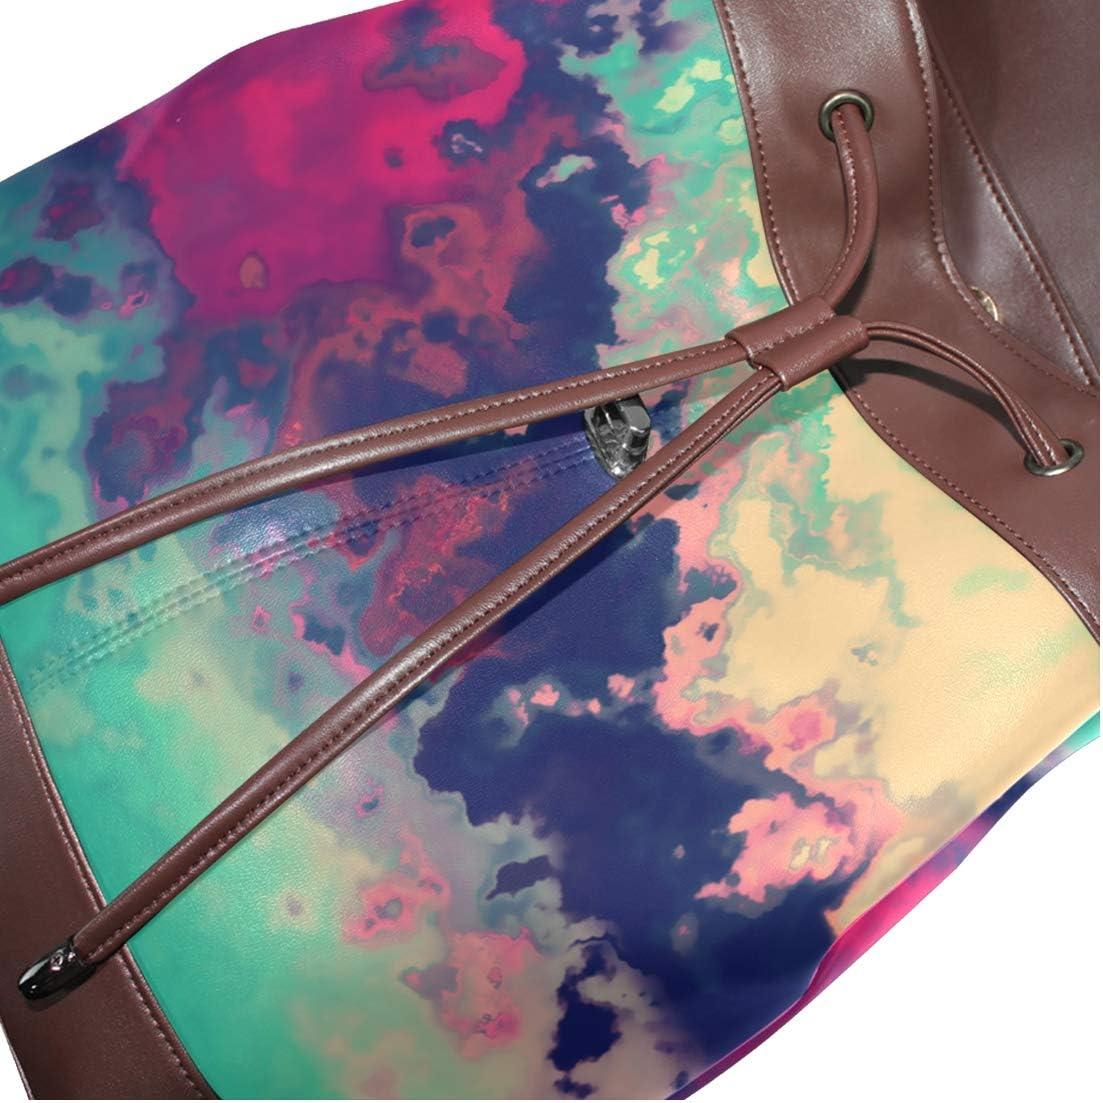 Storage Bag For Men Women Girls Boys Personalized Pattern Art Of Color Shopping Bag Travel Bag School Bag Backpack